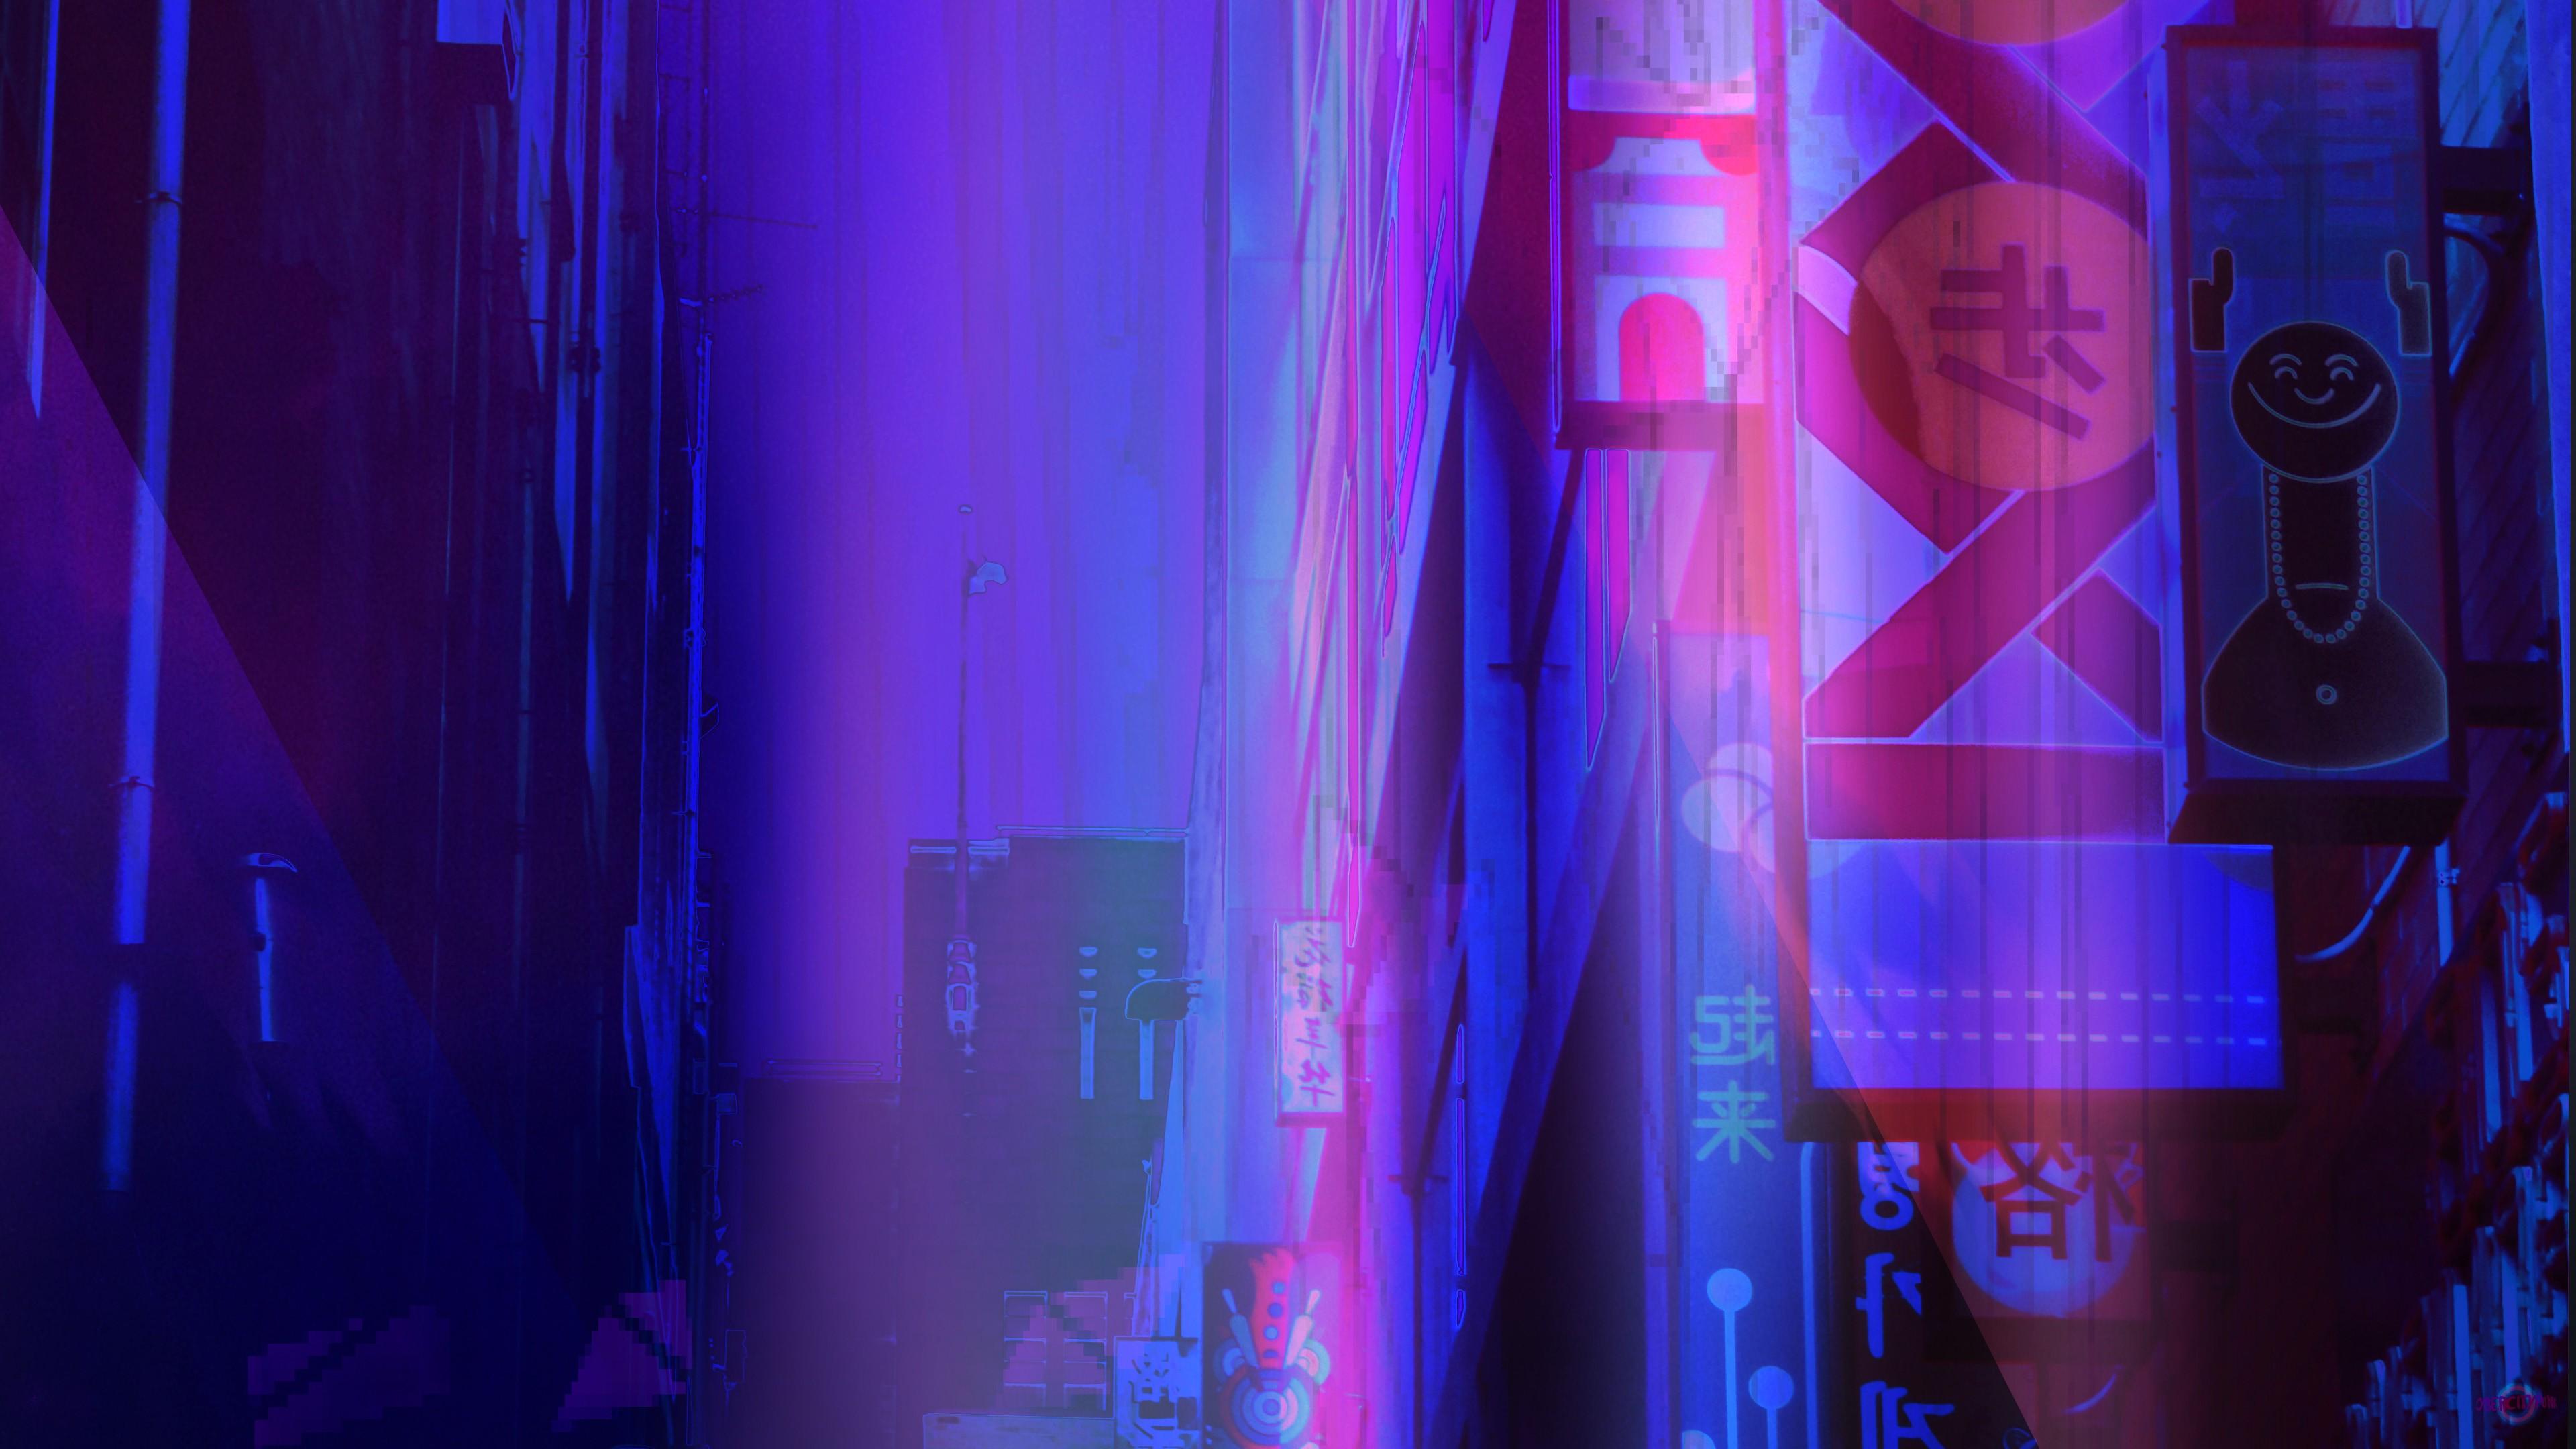 Cyberpunk 4k Ultra Hd Wallpaper Background Image 3840x2160 Id 880404 Wallpaper Abyss